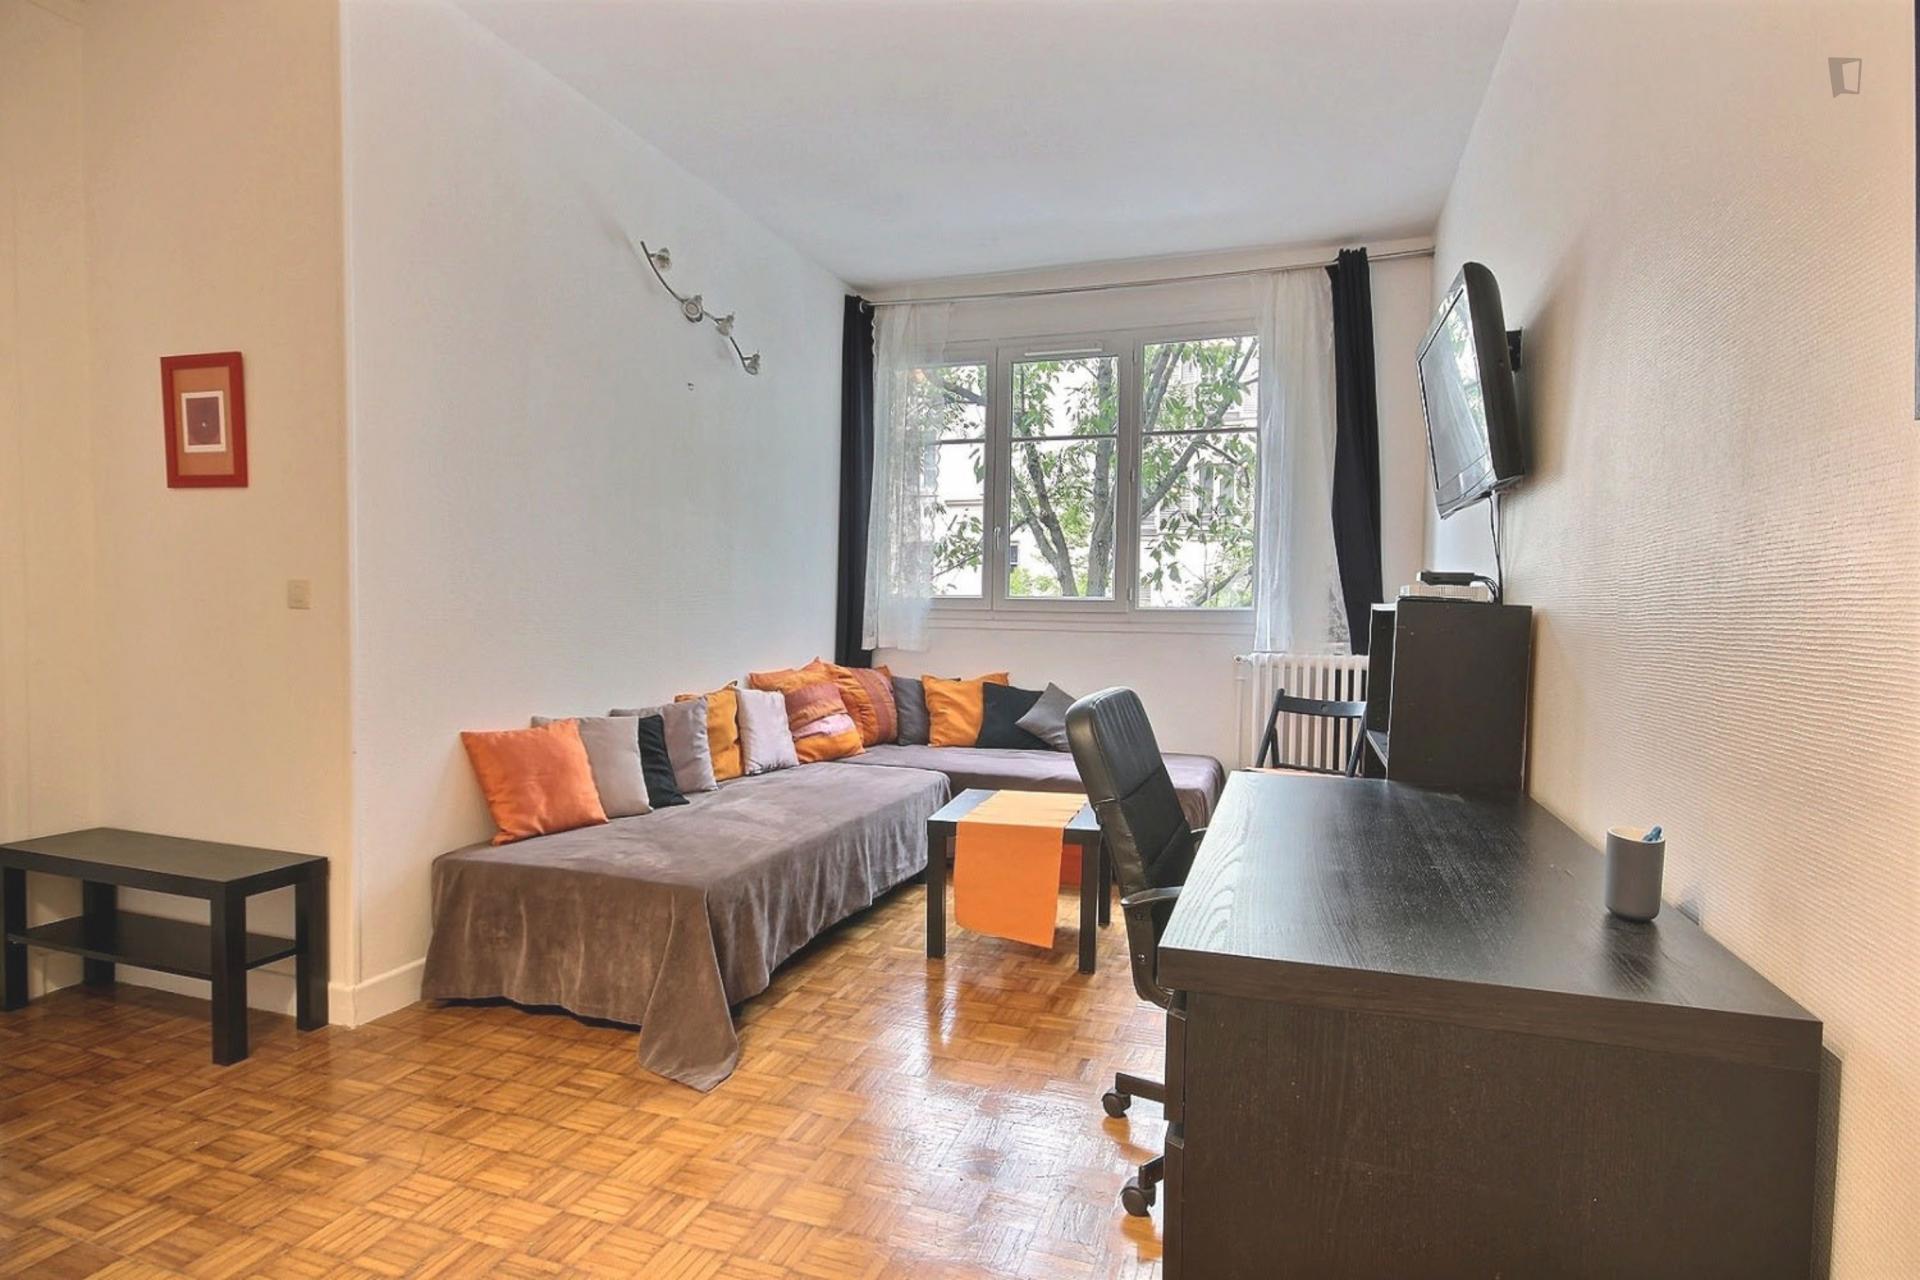 Saint Martin - Welcoming flat in Paris